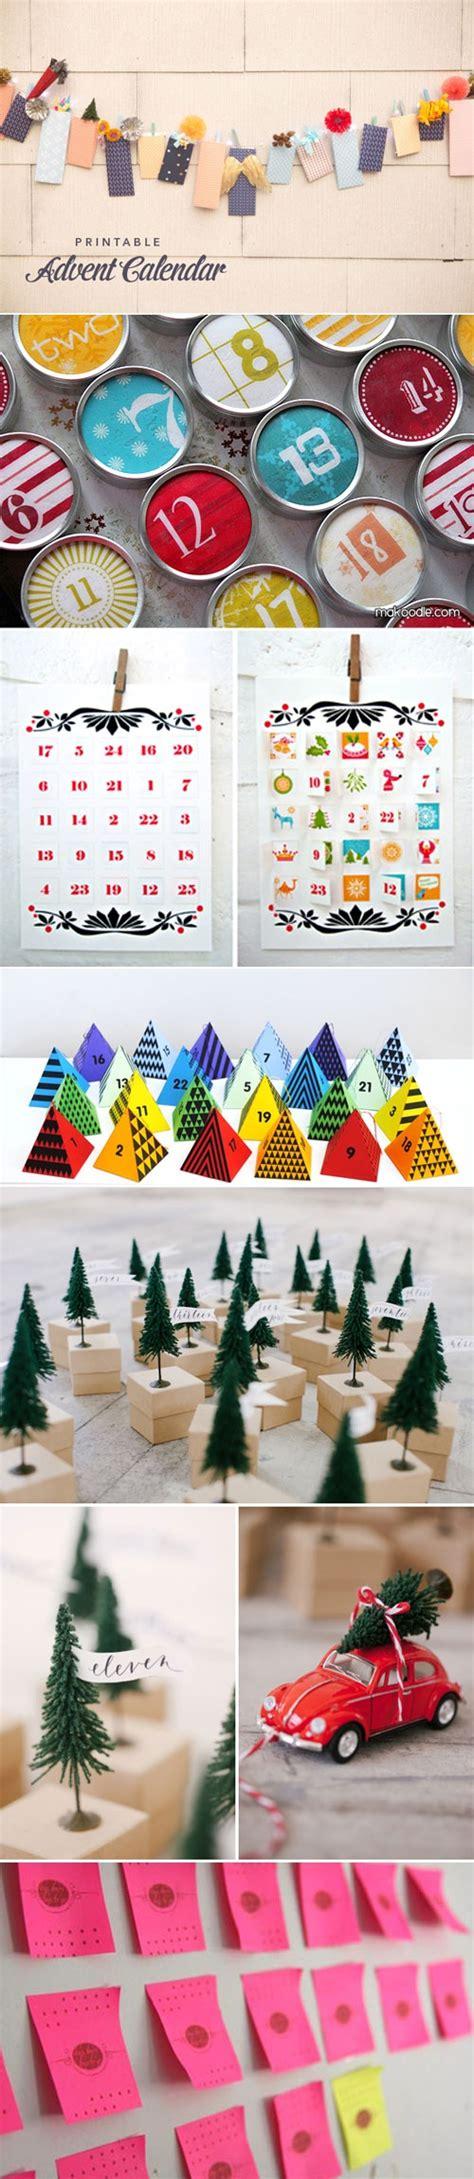 printable advent calendar pinterest printable advent calendars all make able all cute